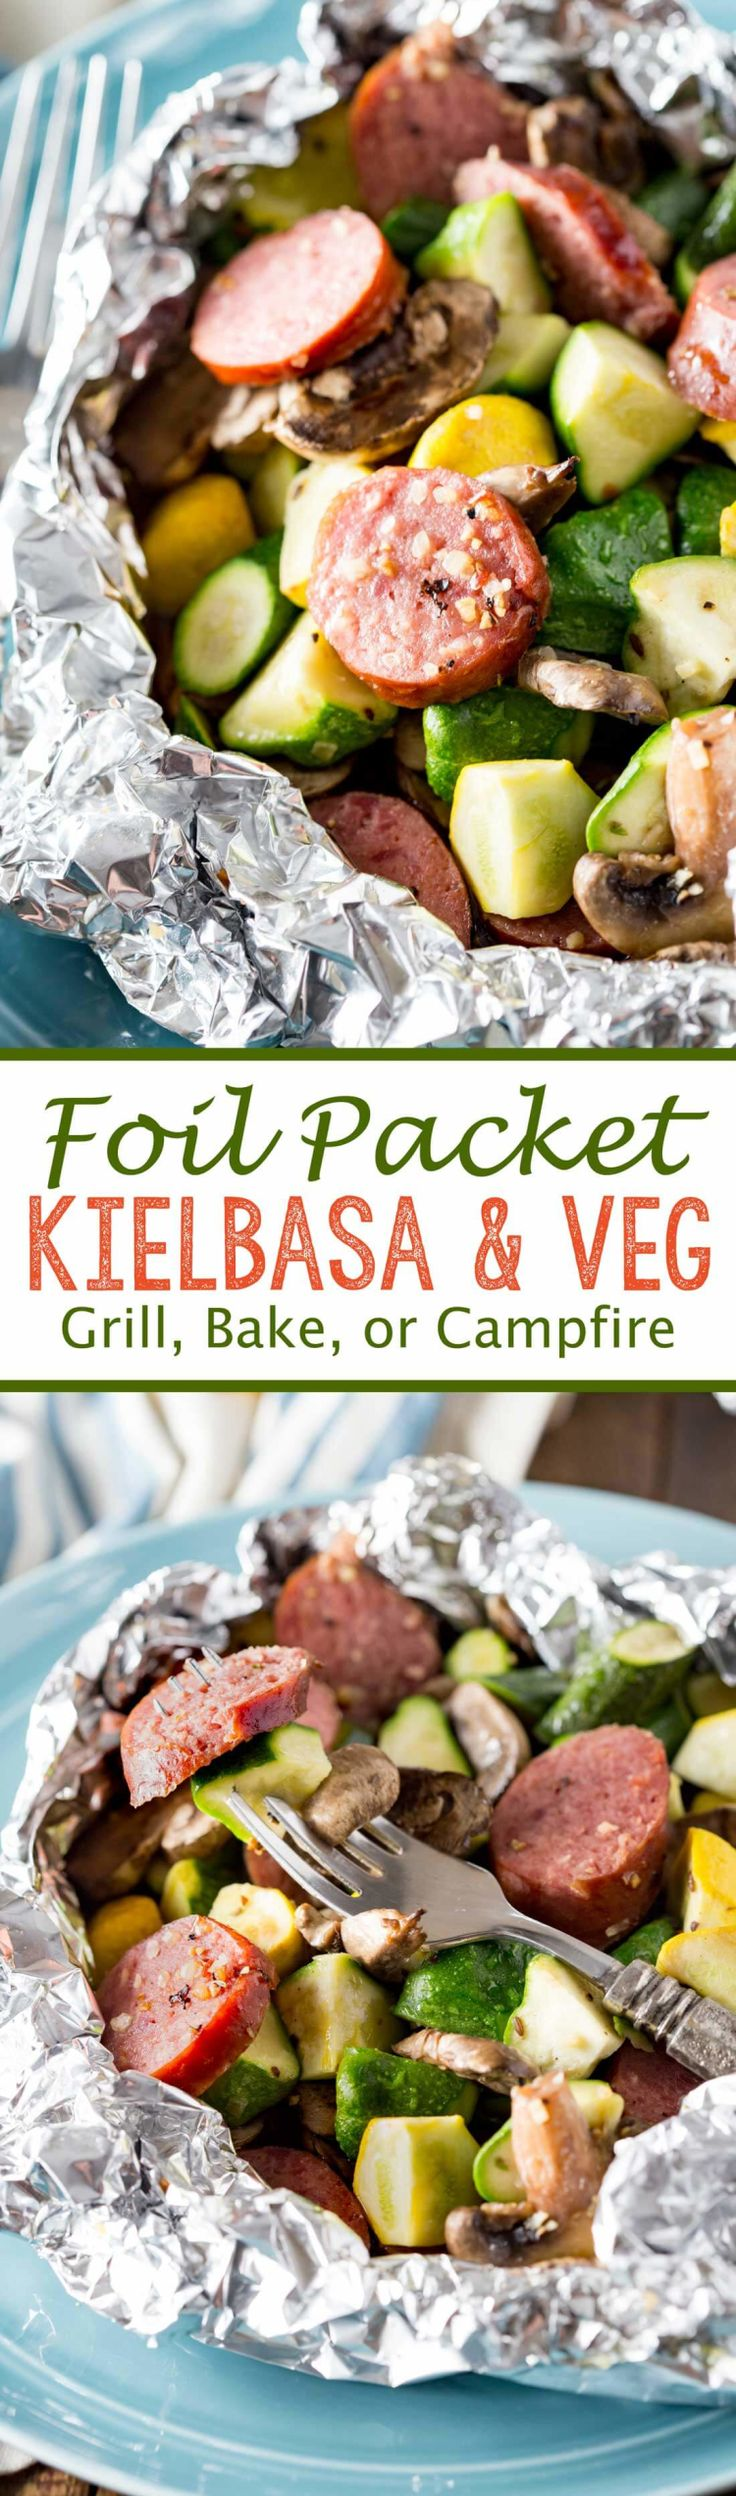 Foil Packet Kielbasa Recipe